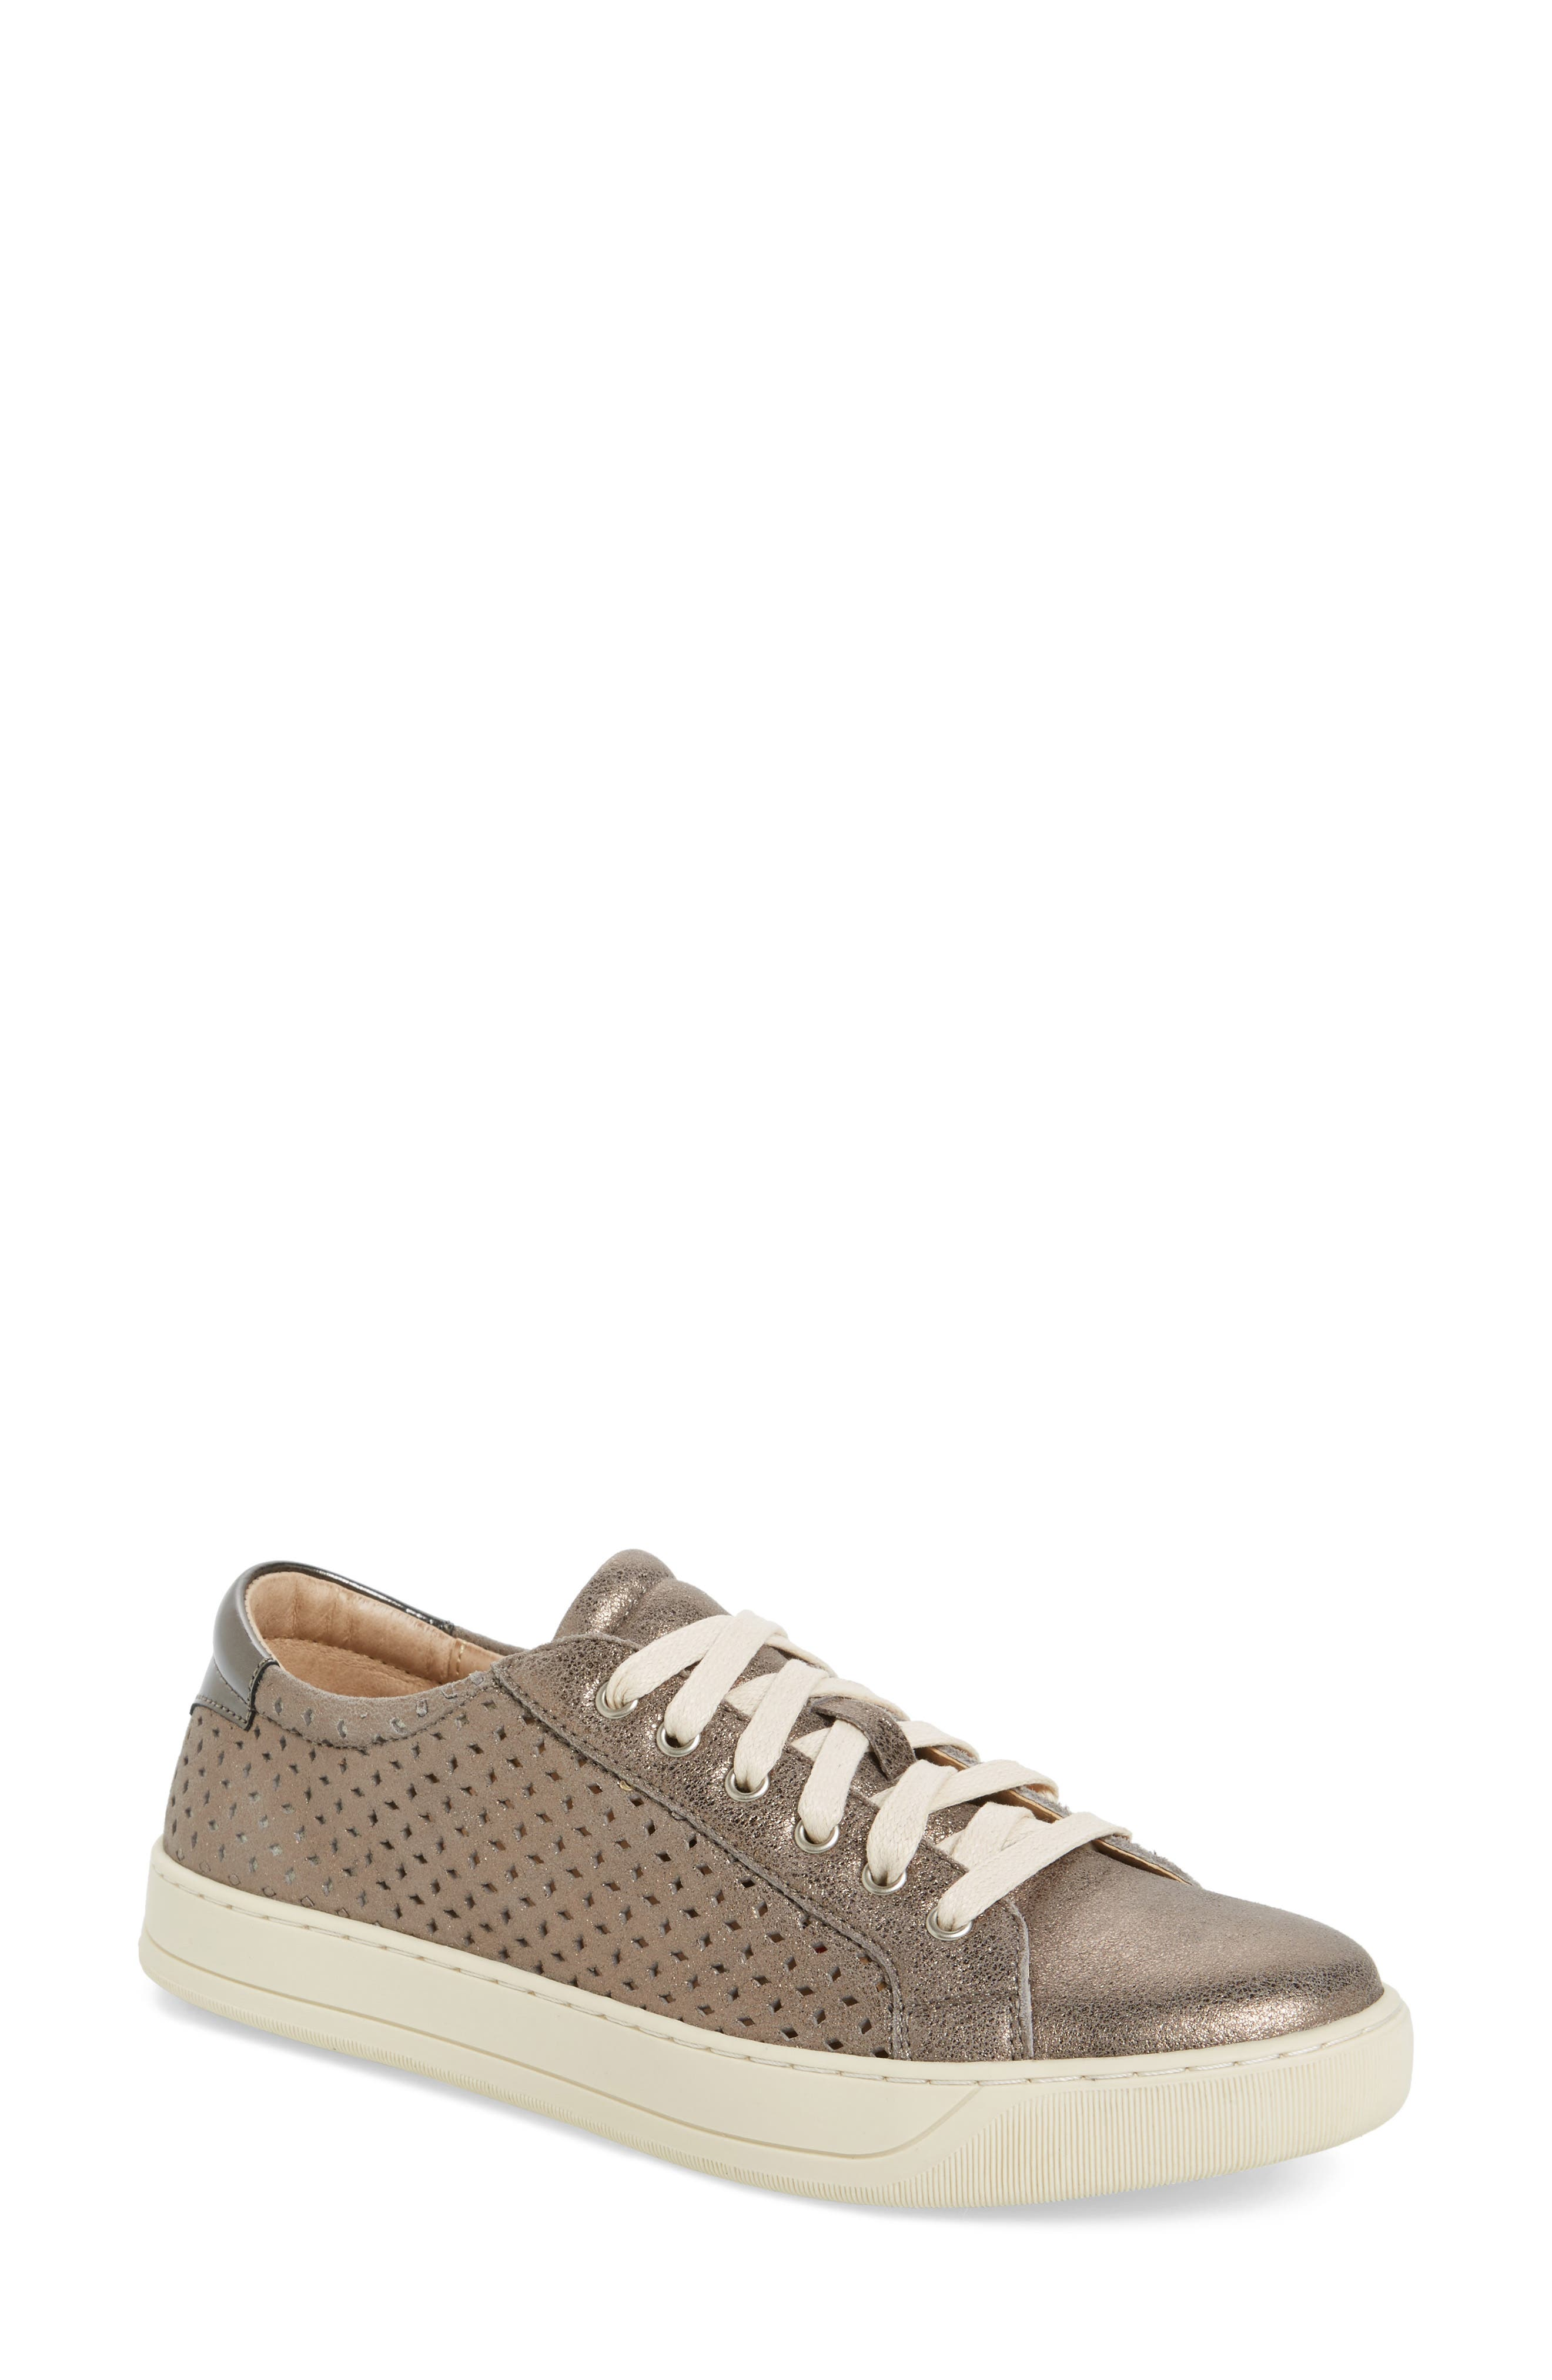 Johnston & Murphy Emerson Perforated Sneaker (Women)